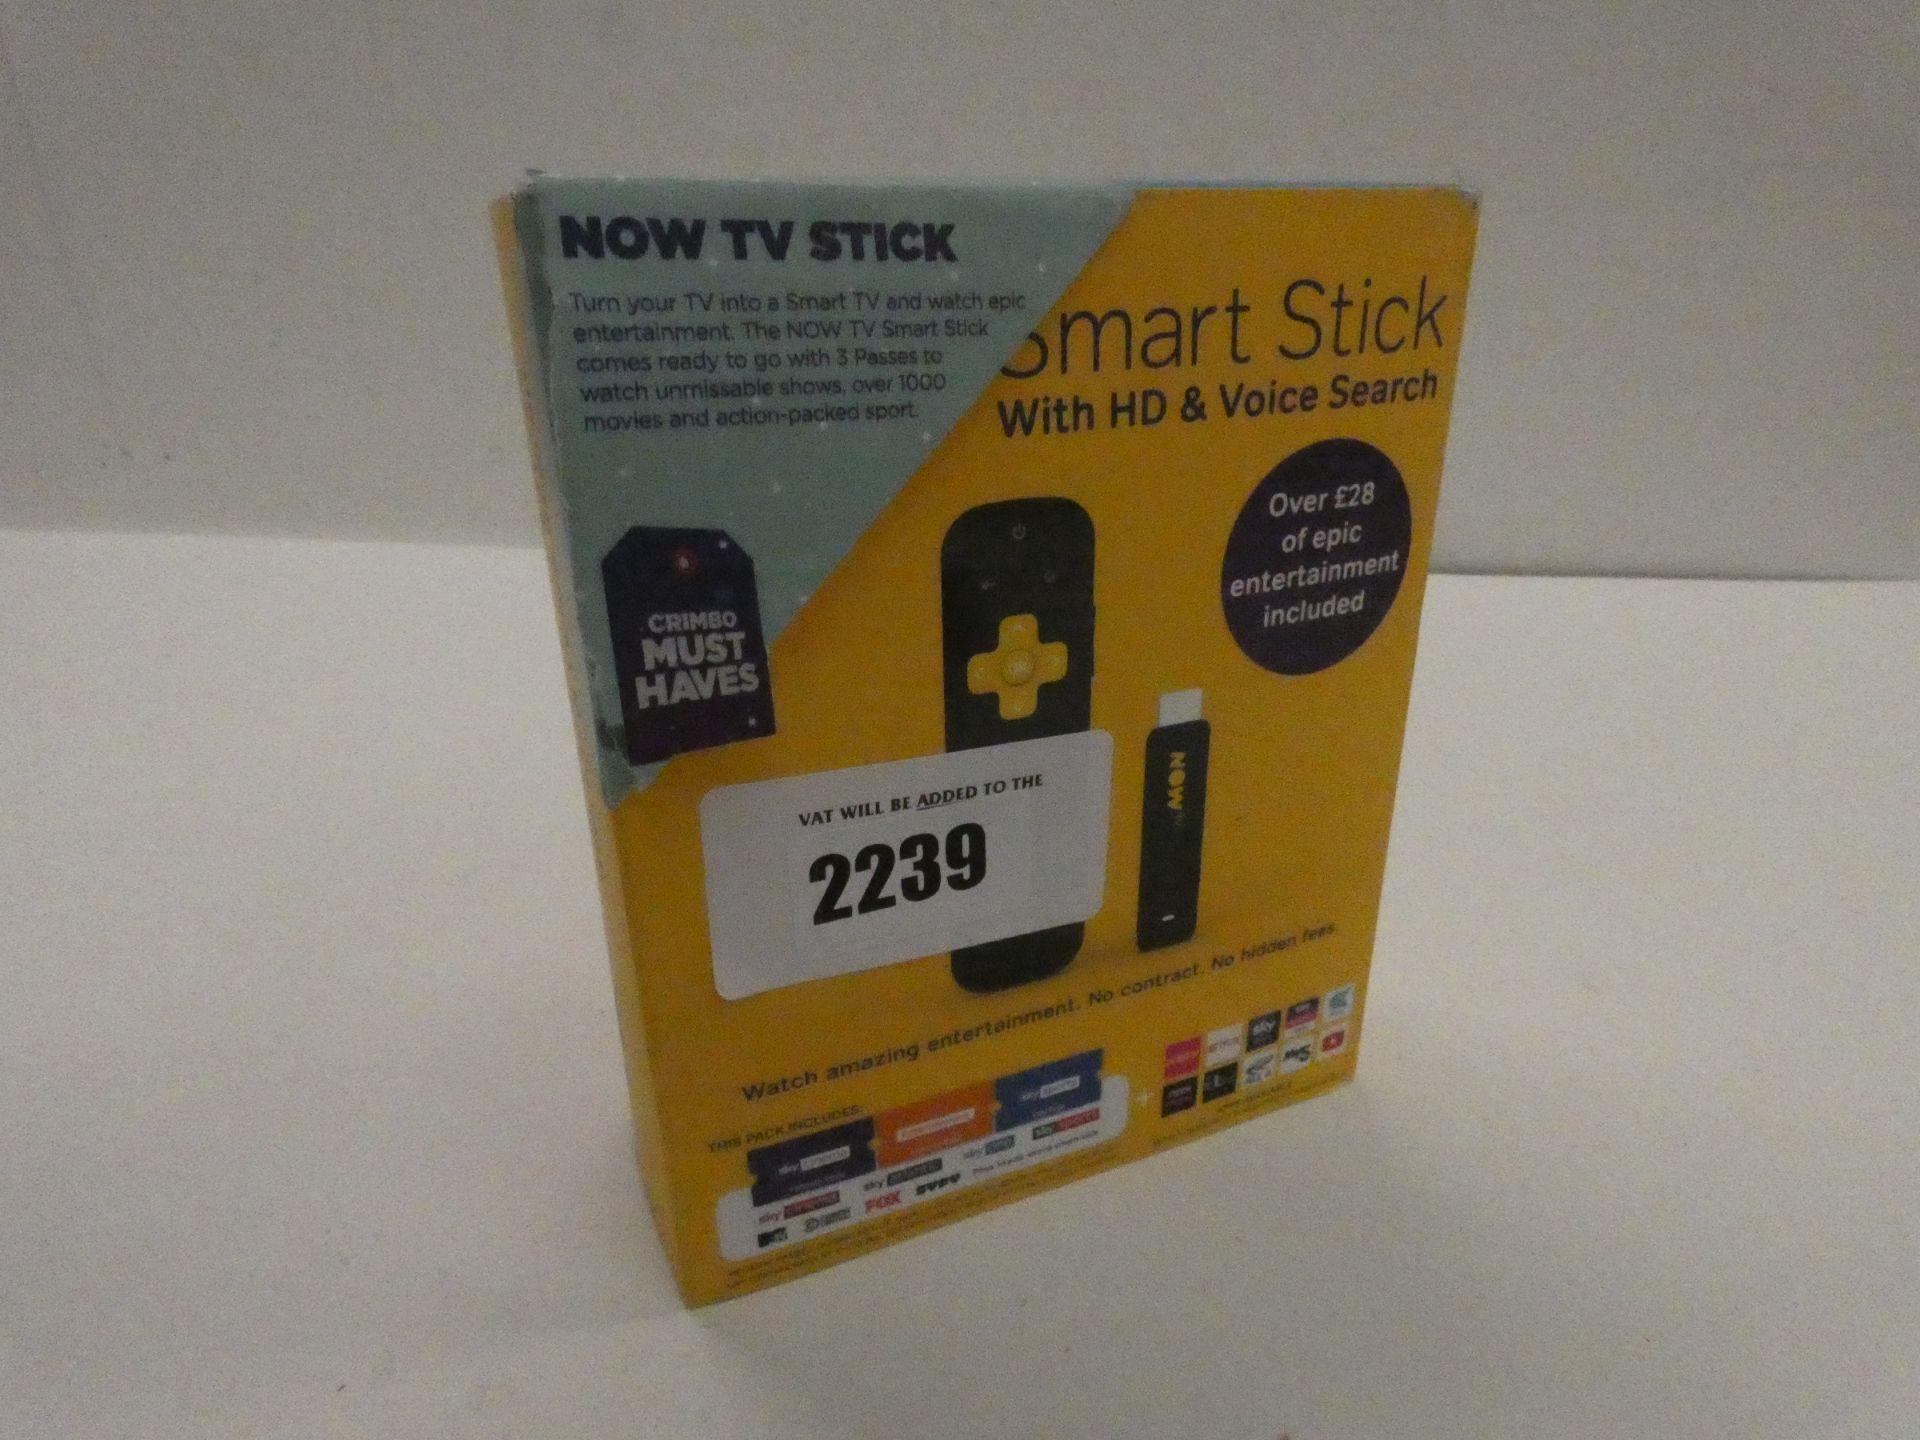 Lot 2239 - NowTV Smart Stick